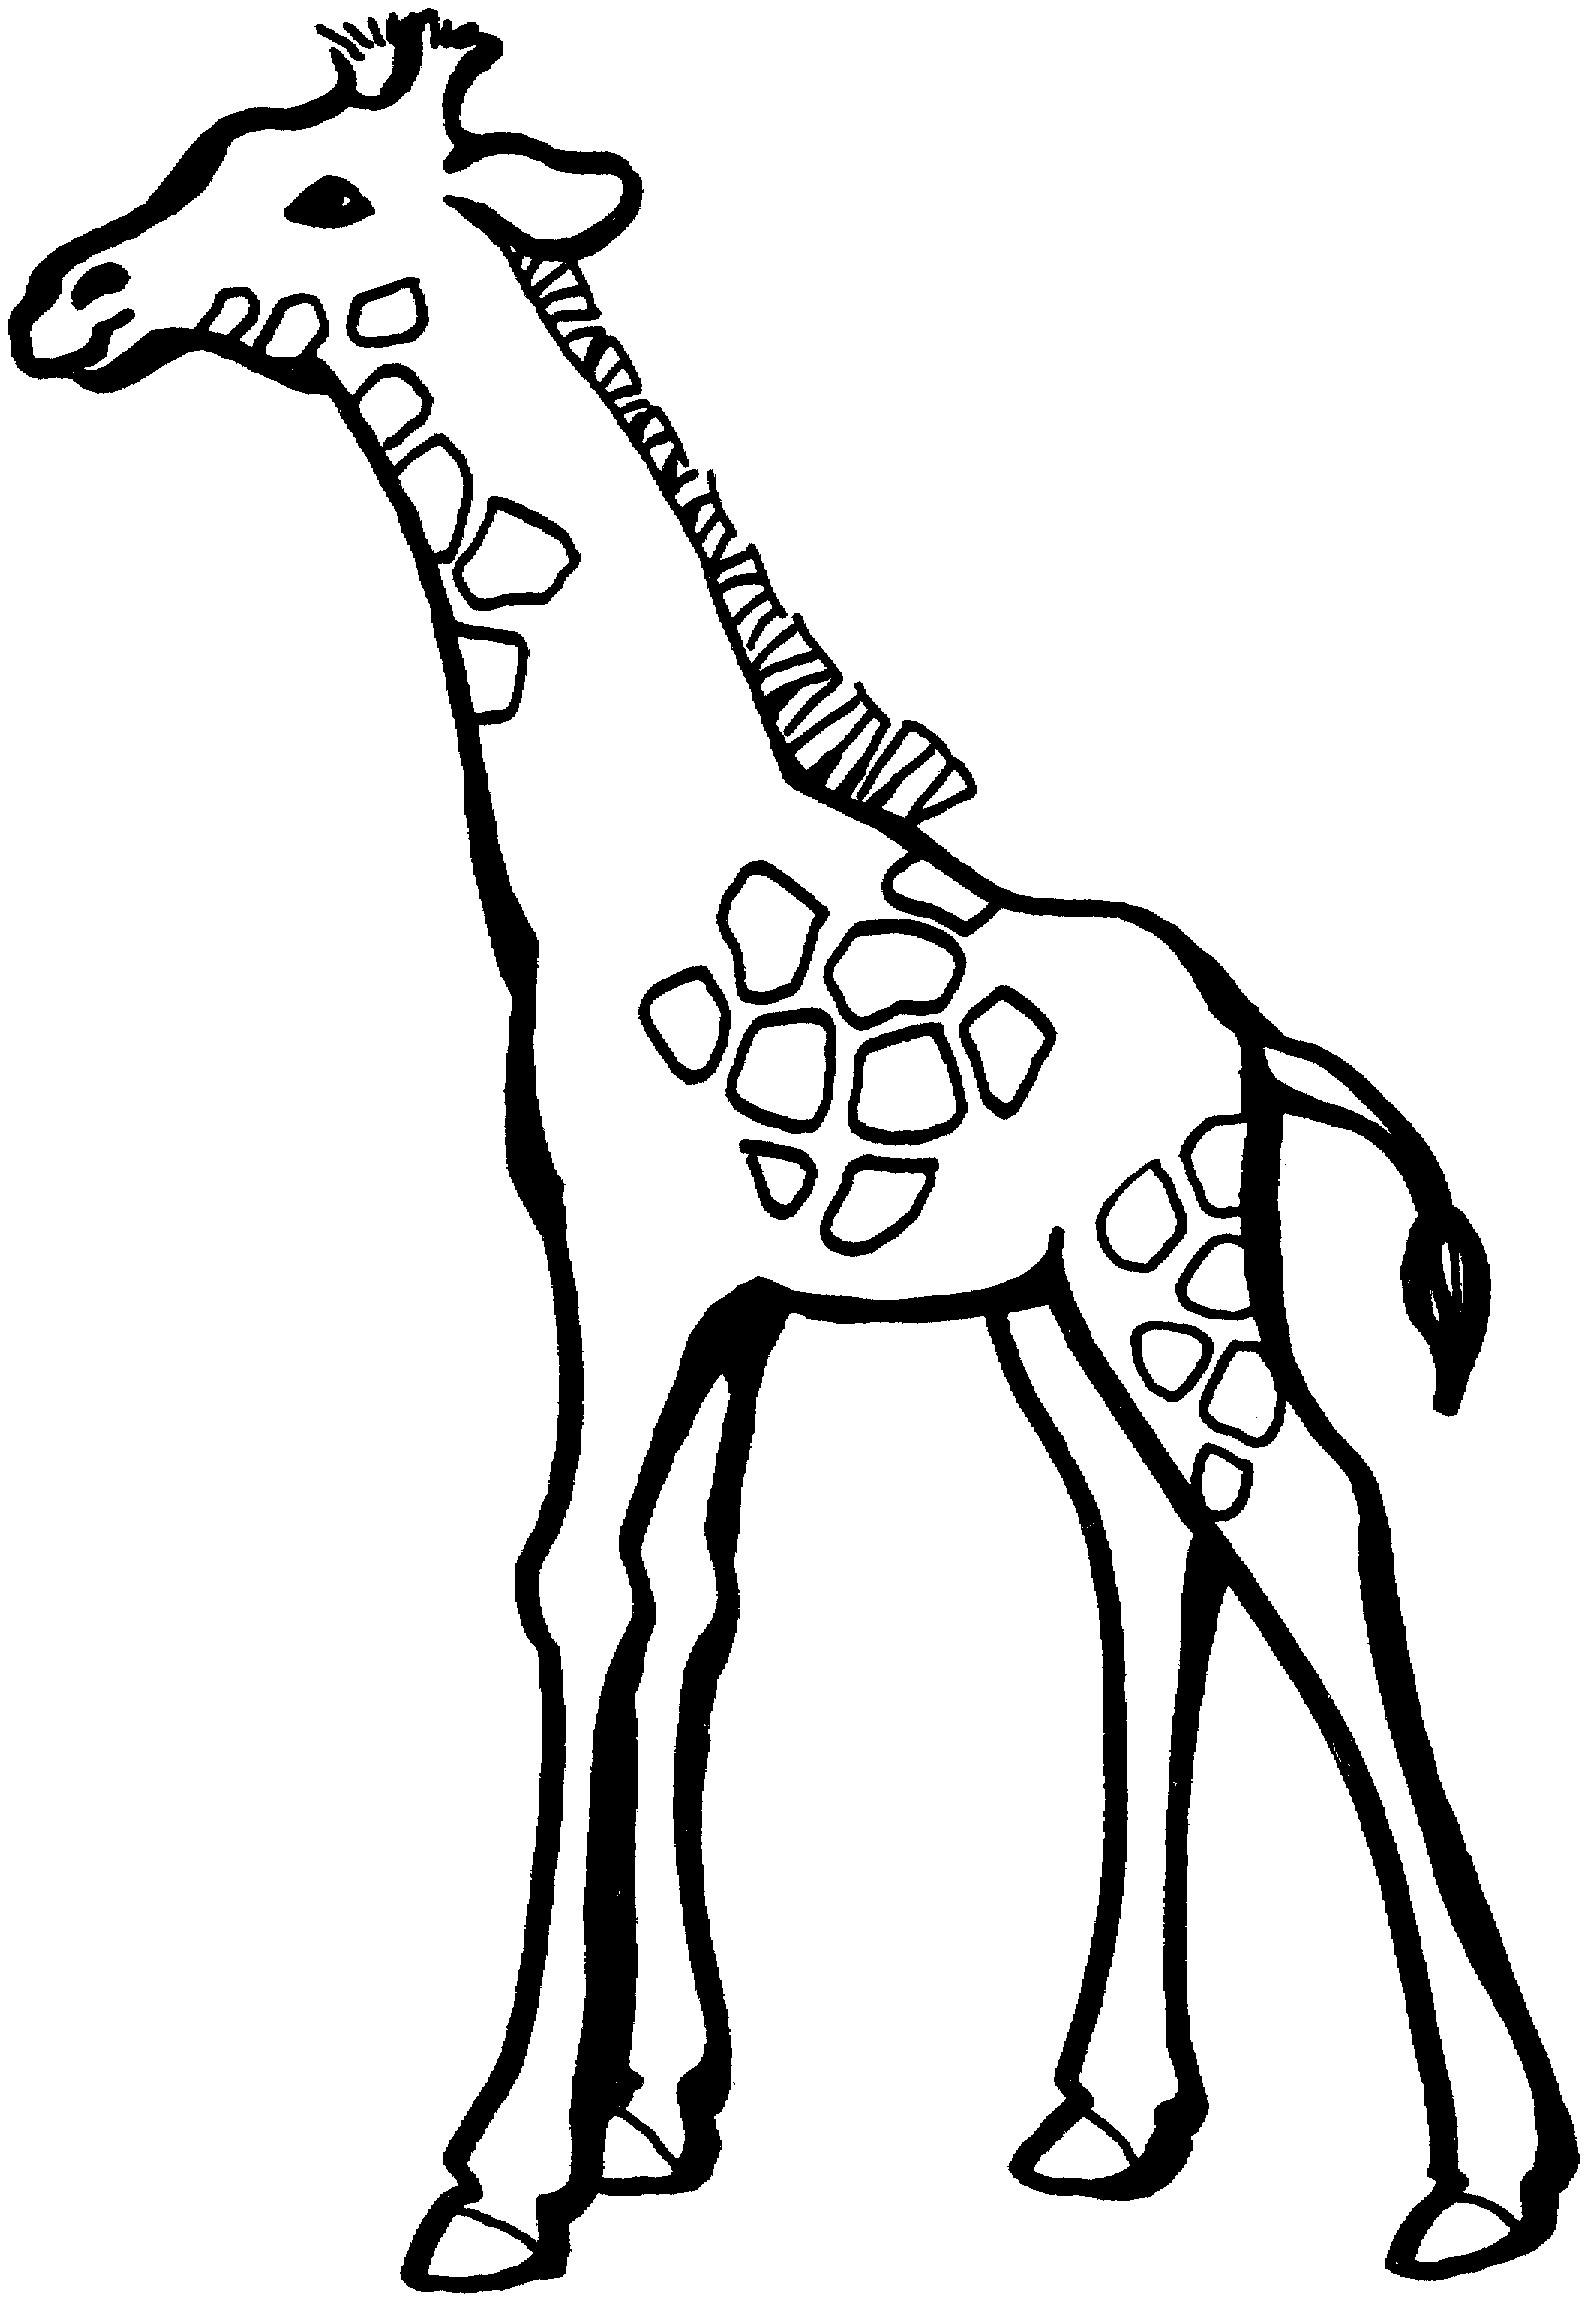 Free printables giraffe in plane clipart image library library Giraffe Coloring Page. giraffe colouring page. giraffes coloring ... image library library